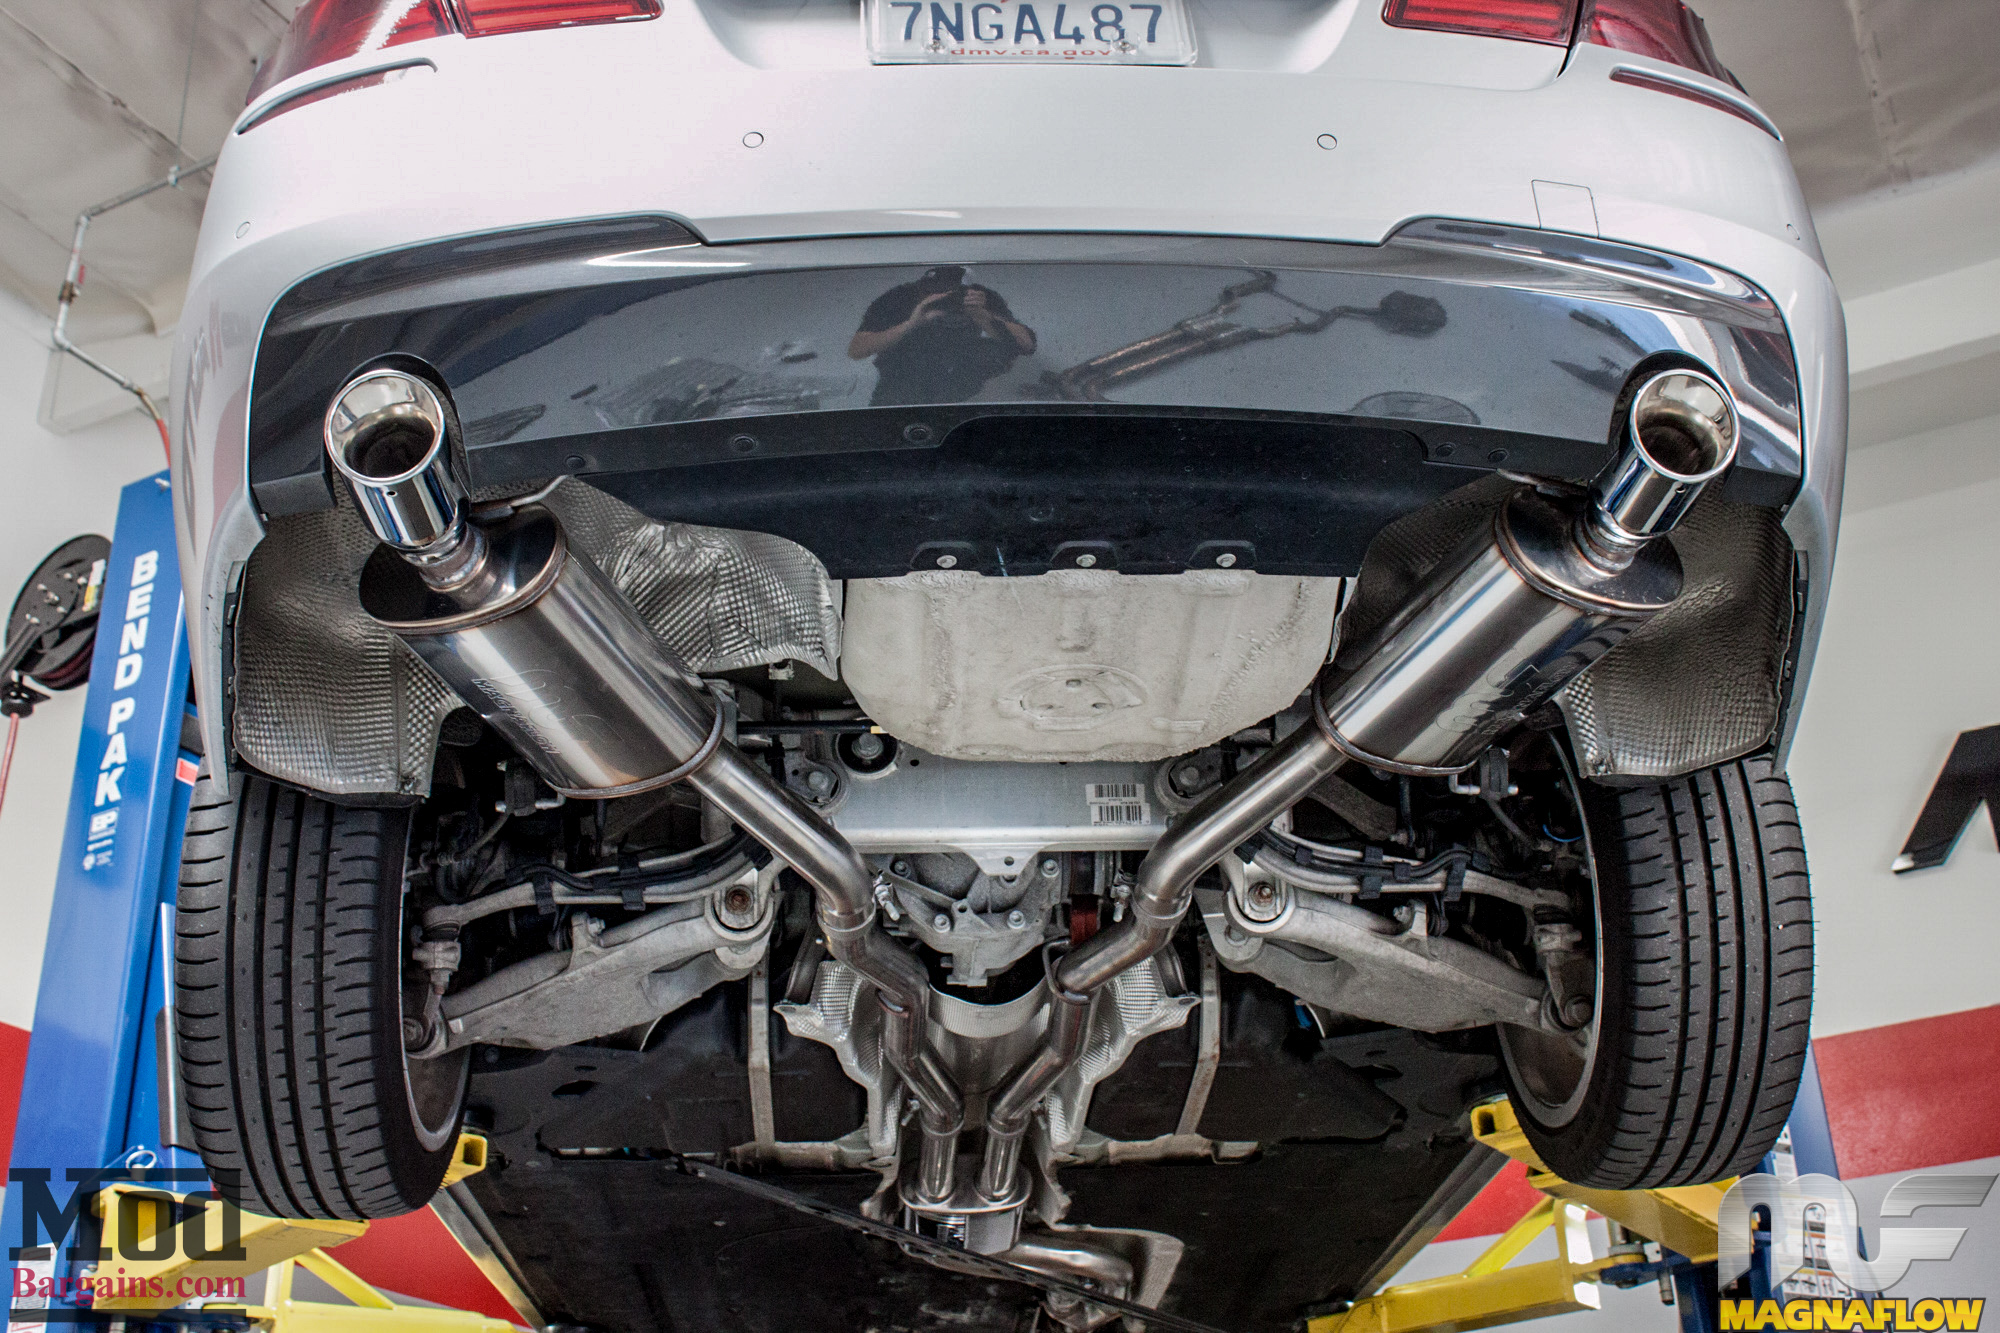 F10 Bmw 535i Magnaflow Exhaust Installed Modauto